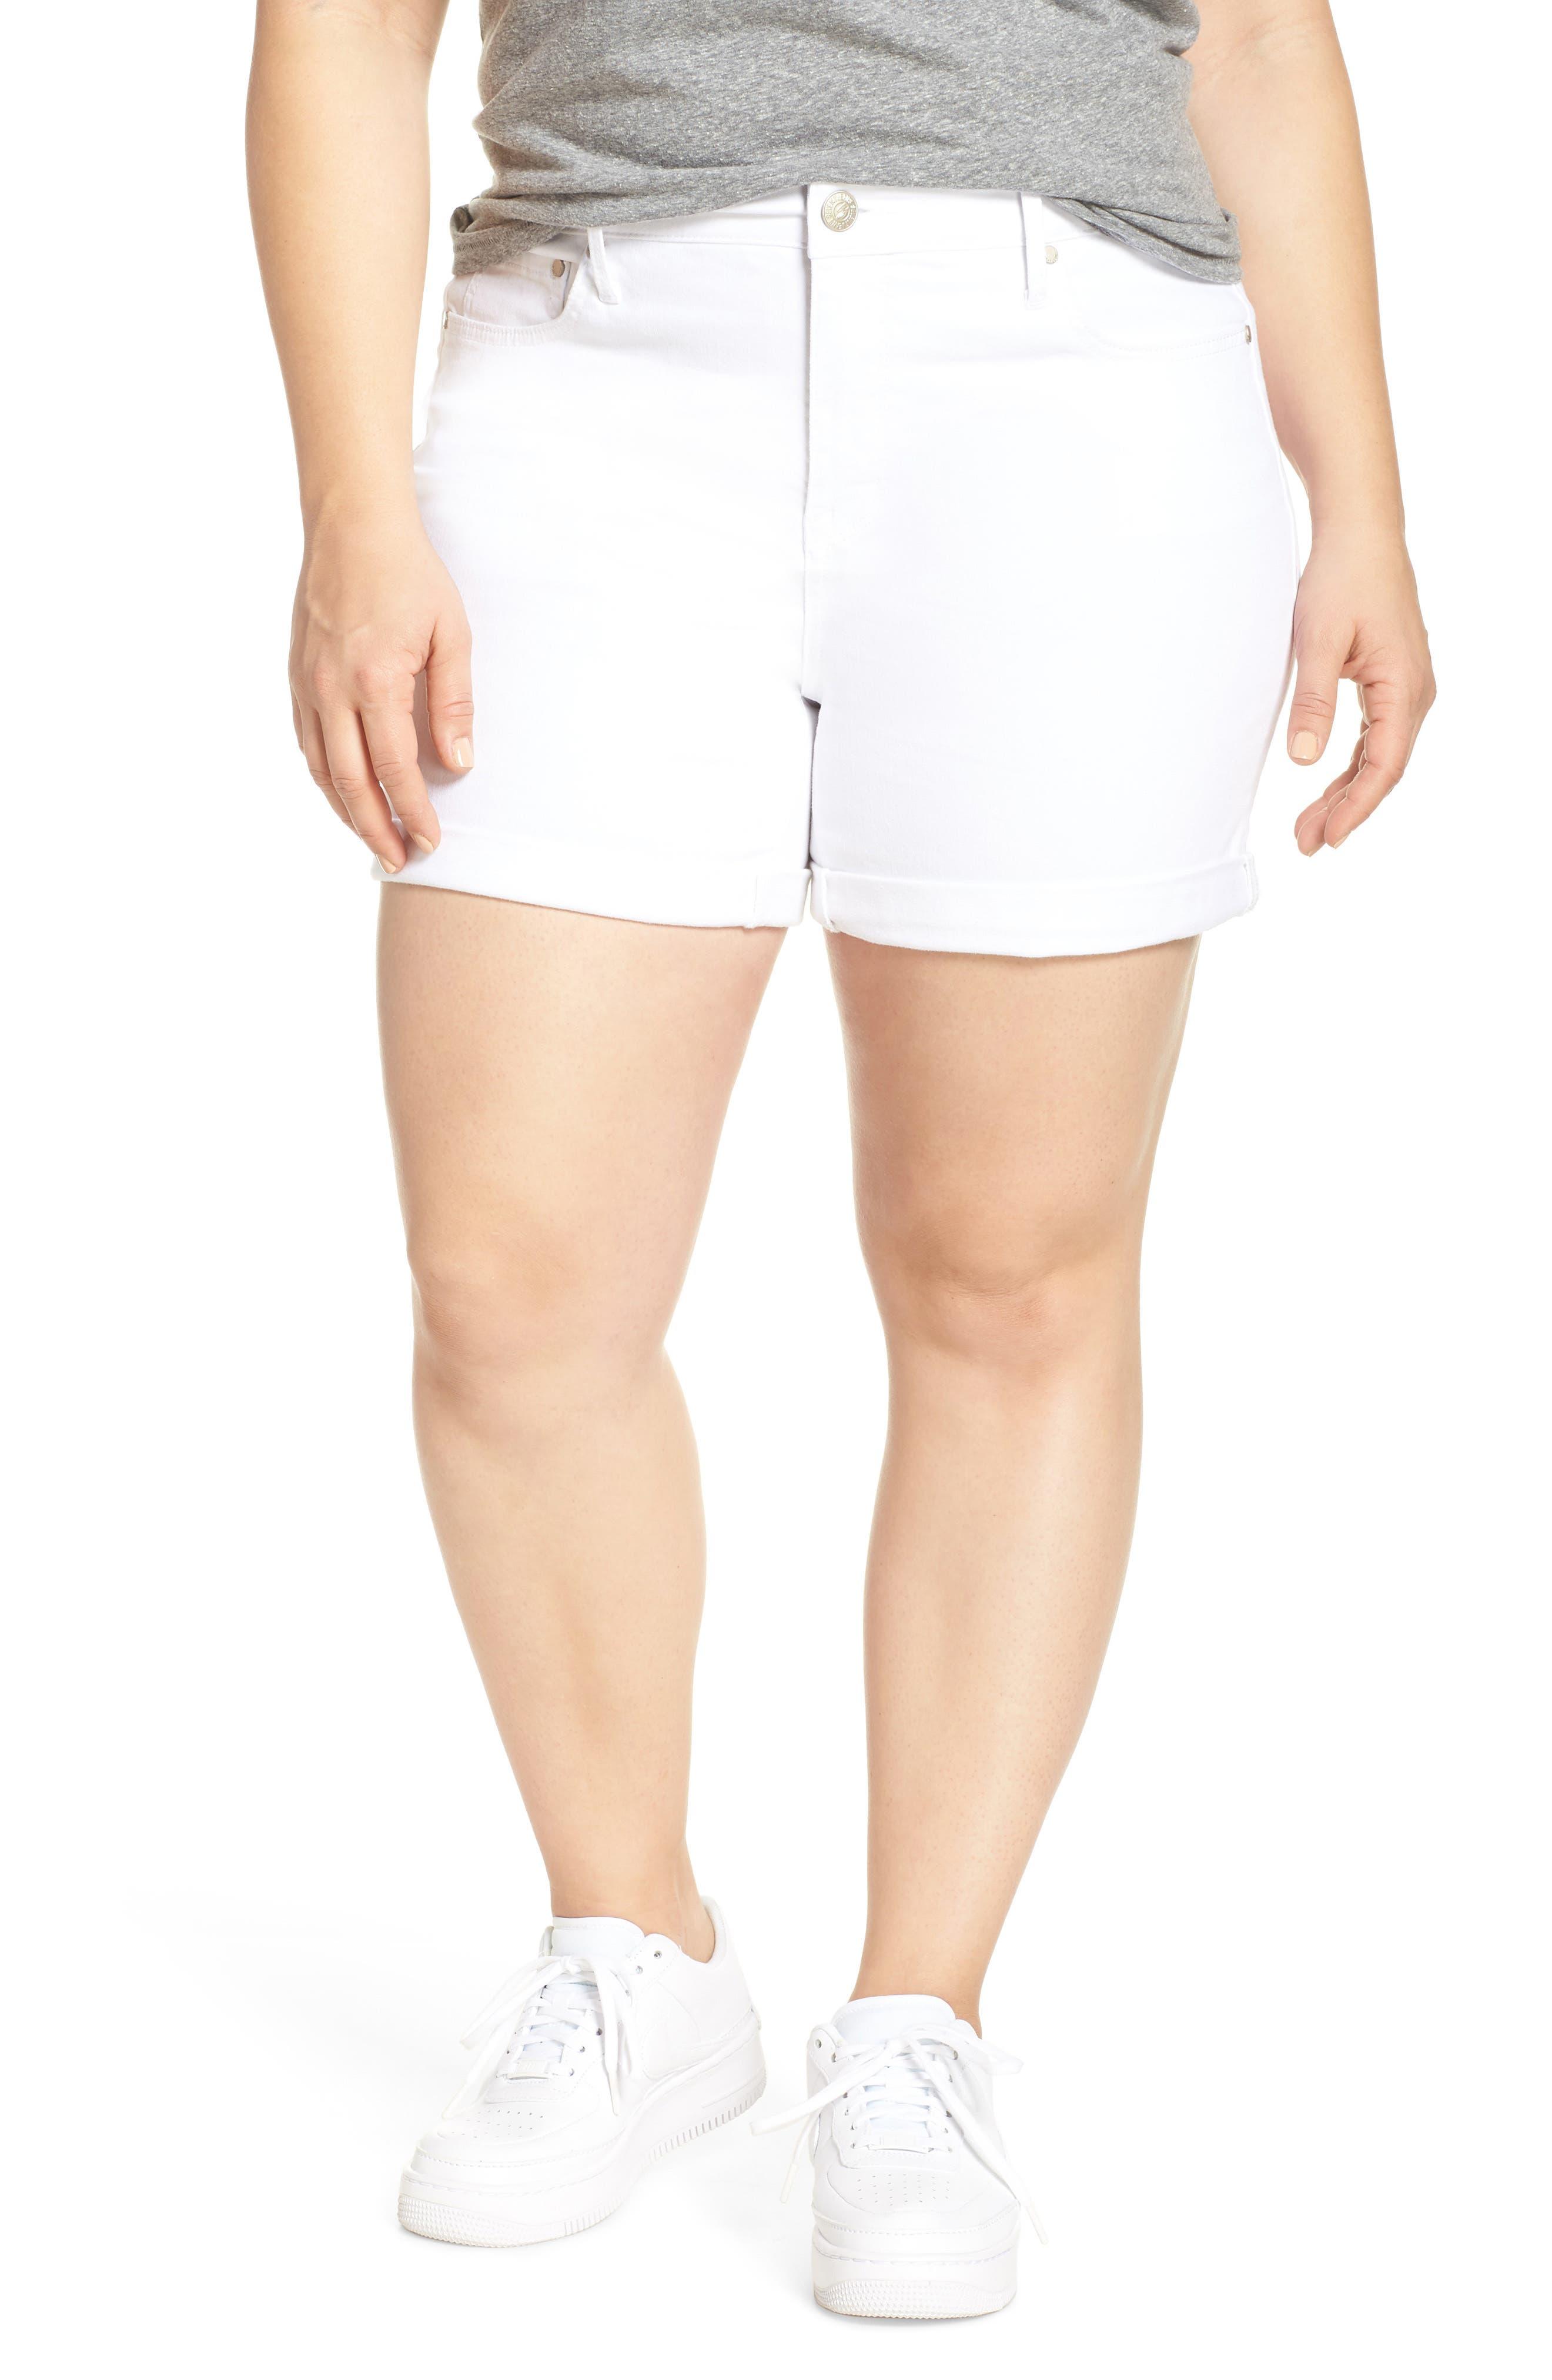 High Waist Stretch Denim Shorts by Seven7